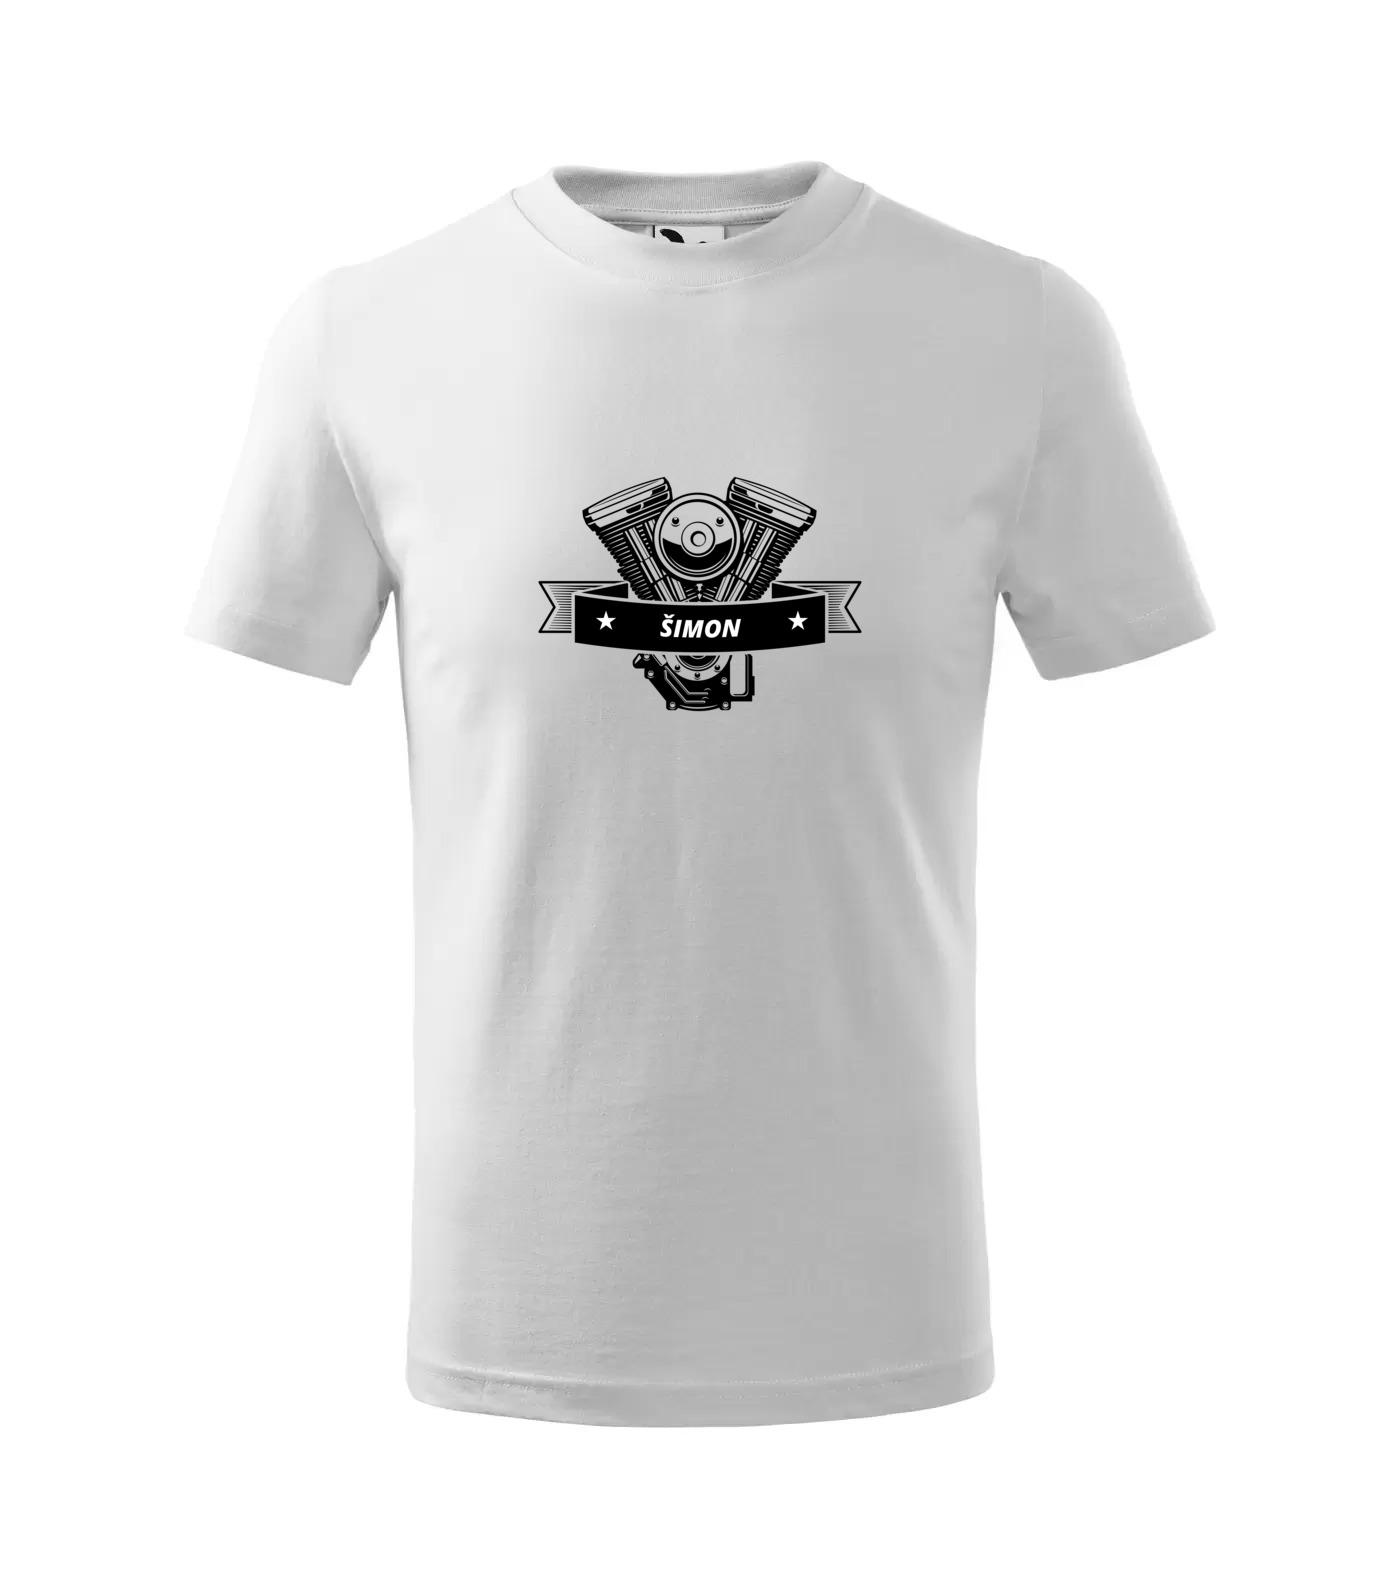 Tričko Motorkář Šimon